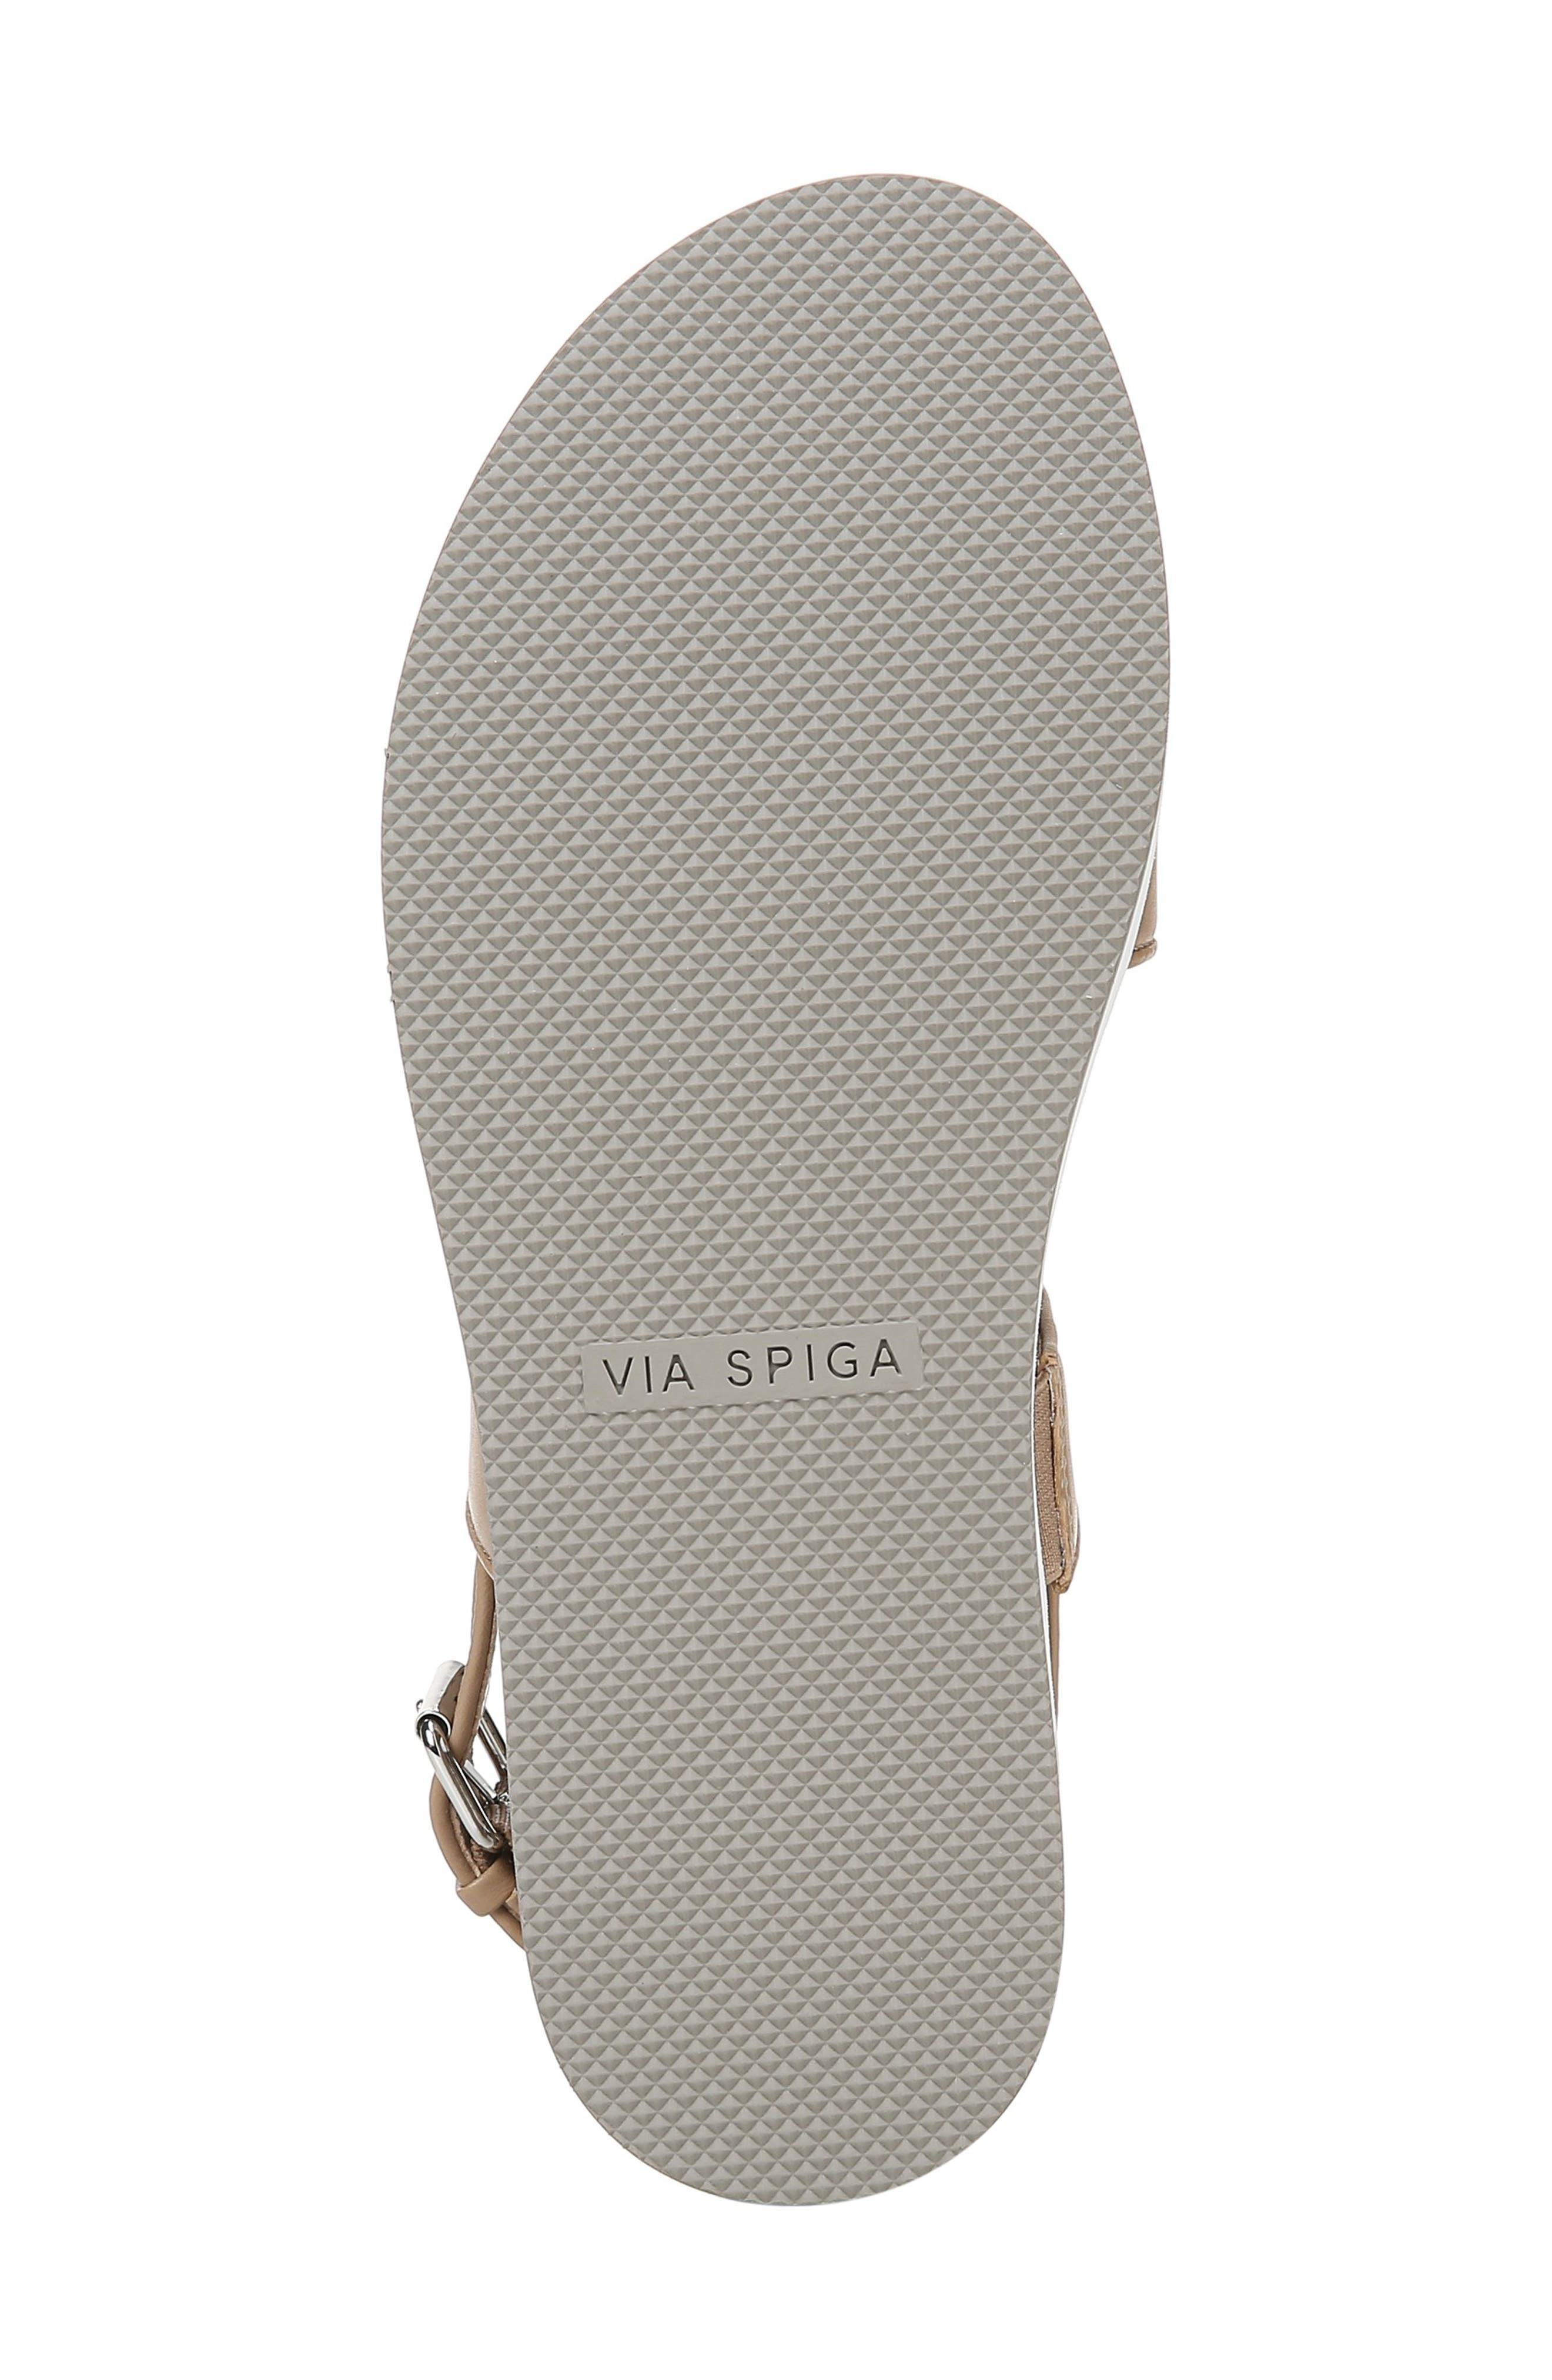 VIA SPIGA, Davi Platform Sandal, Alternate thumbnail 6, color, DESERT NAPPA